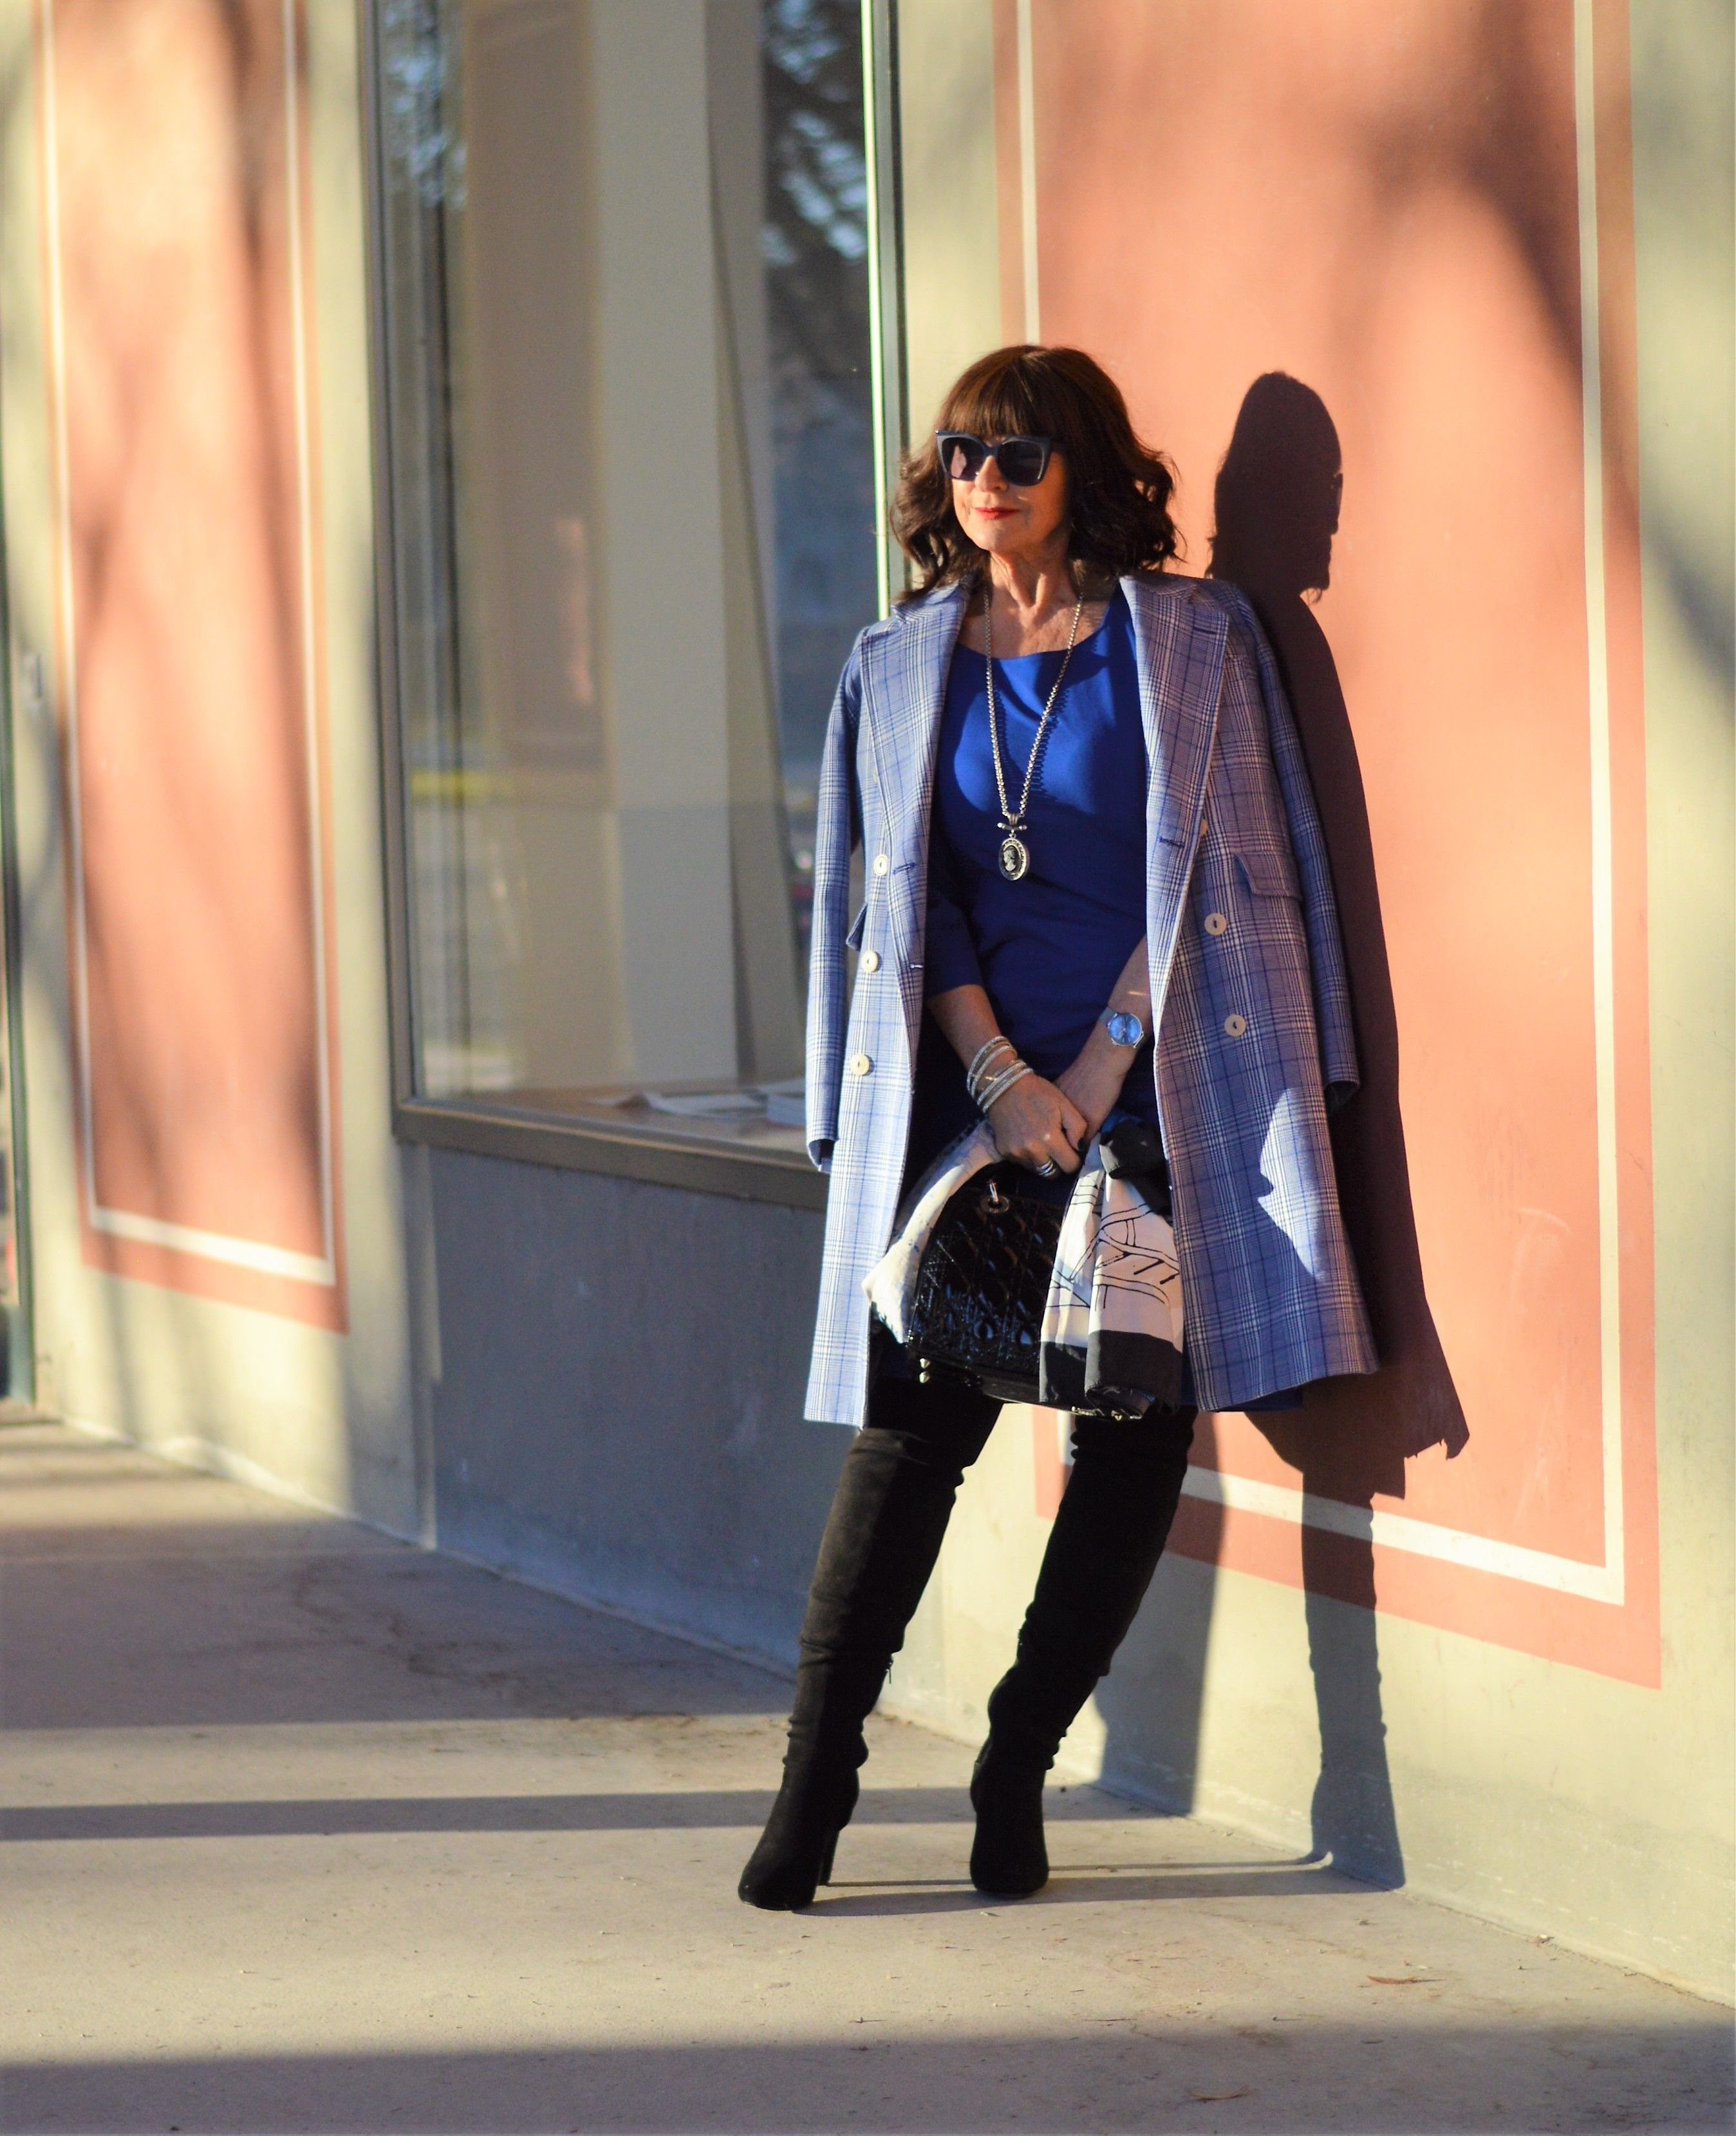 Die Elegante Farbe Taupe: Classic Blue - Die Pantone Farbe Des Jahres 2020